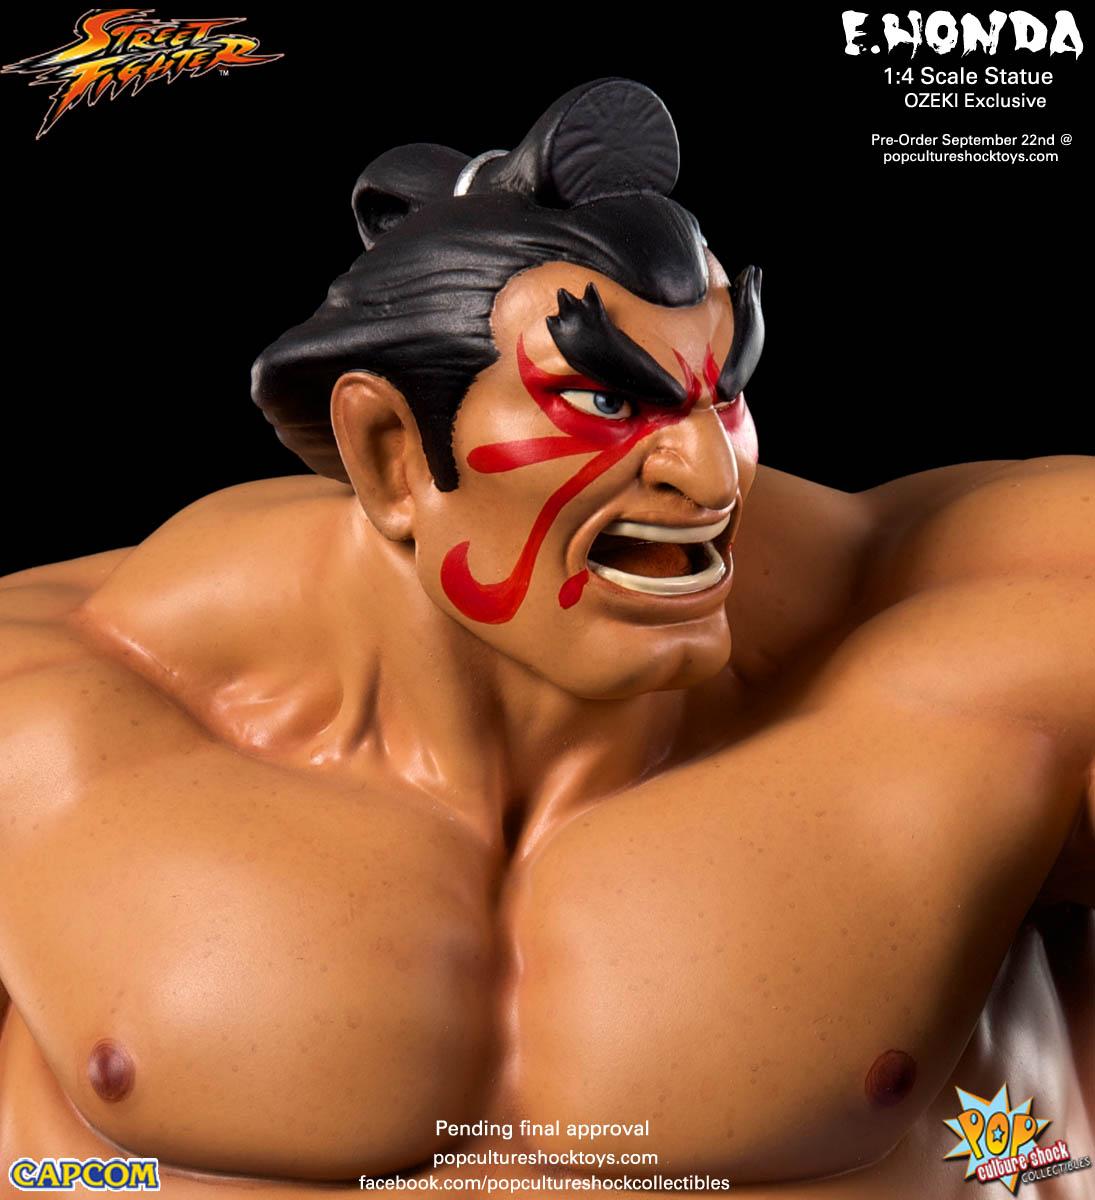 [Pop Culture Shock] Street Fighter: E. Honda 1/4 Statue - Página 3 Street-Fighter-E.-Honda-ozeki-Statue-014